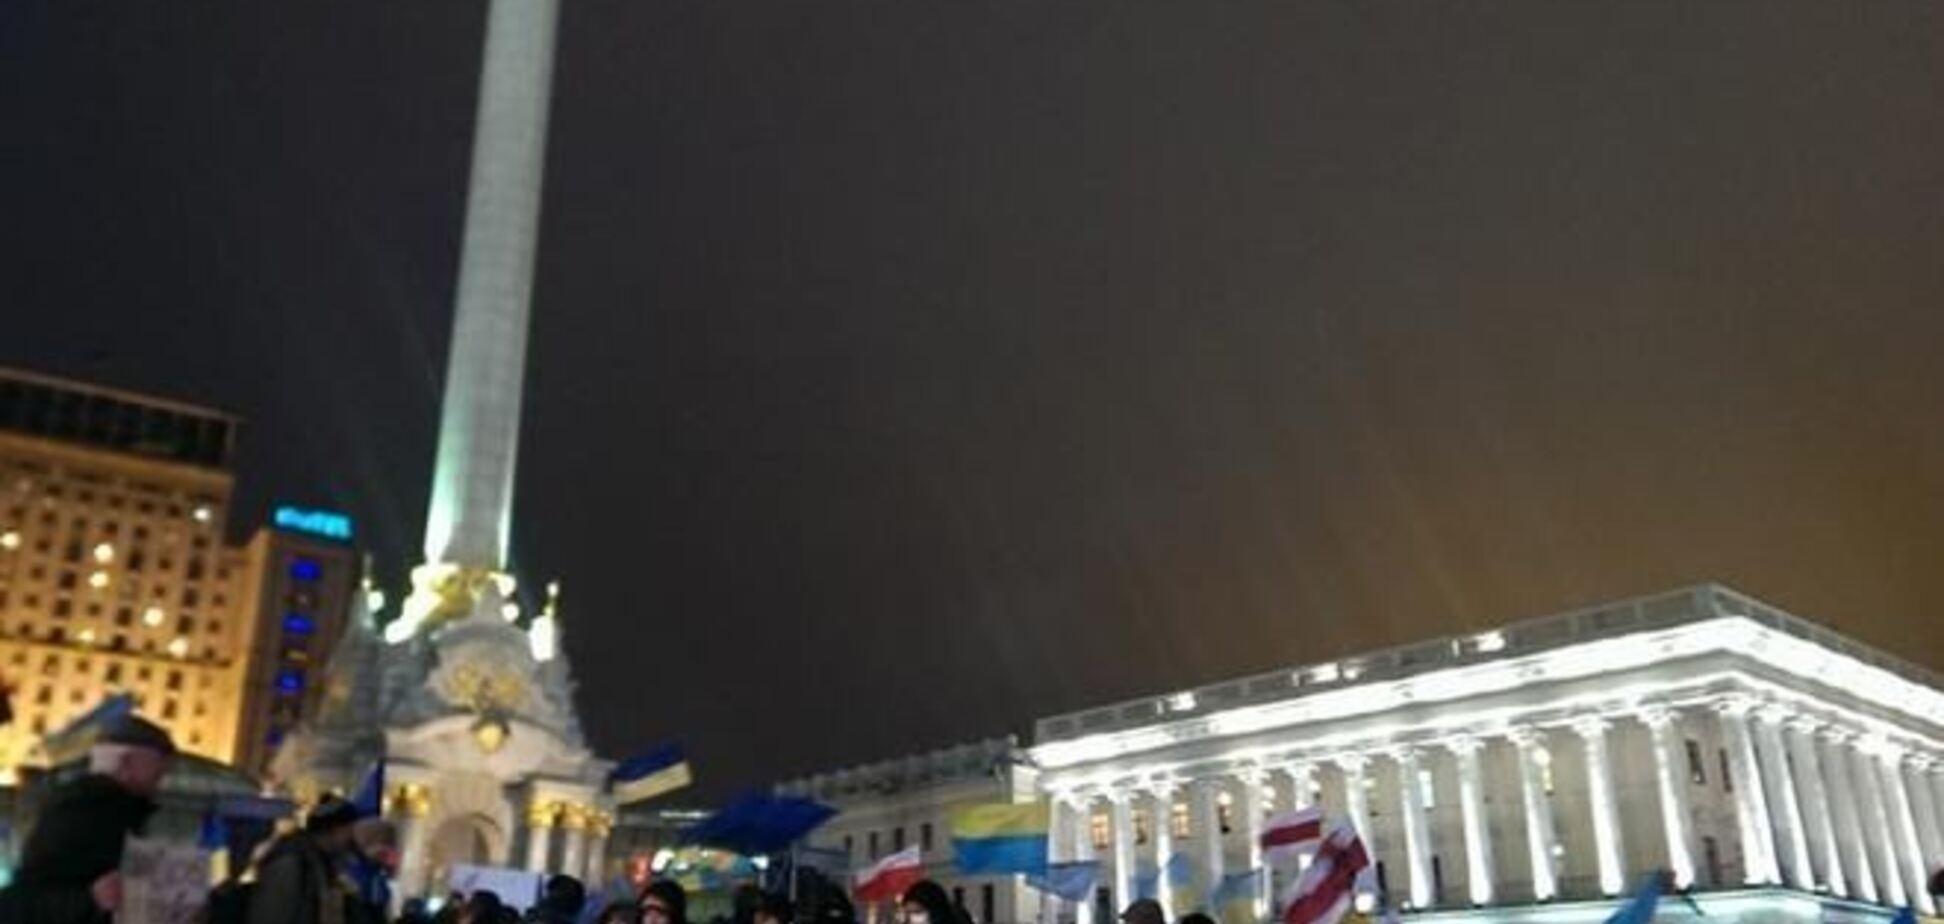 На Евромайдане организовали альтернативную сцену